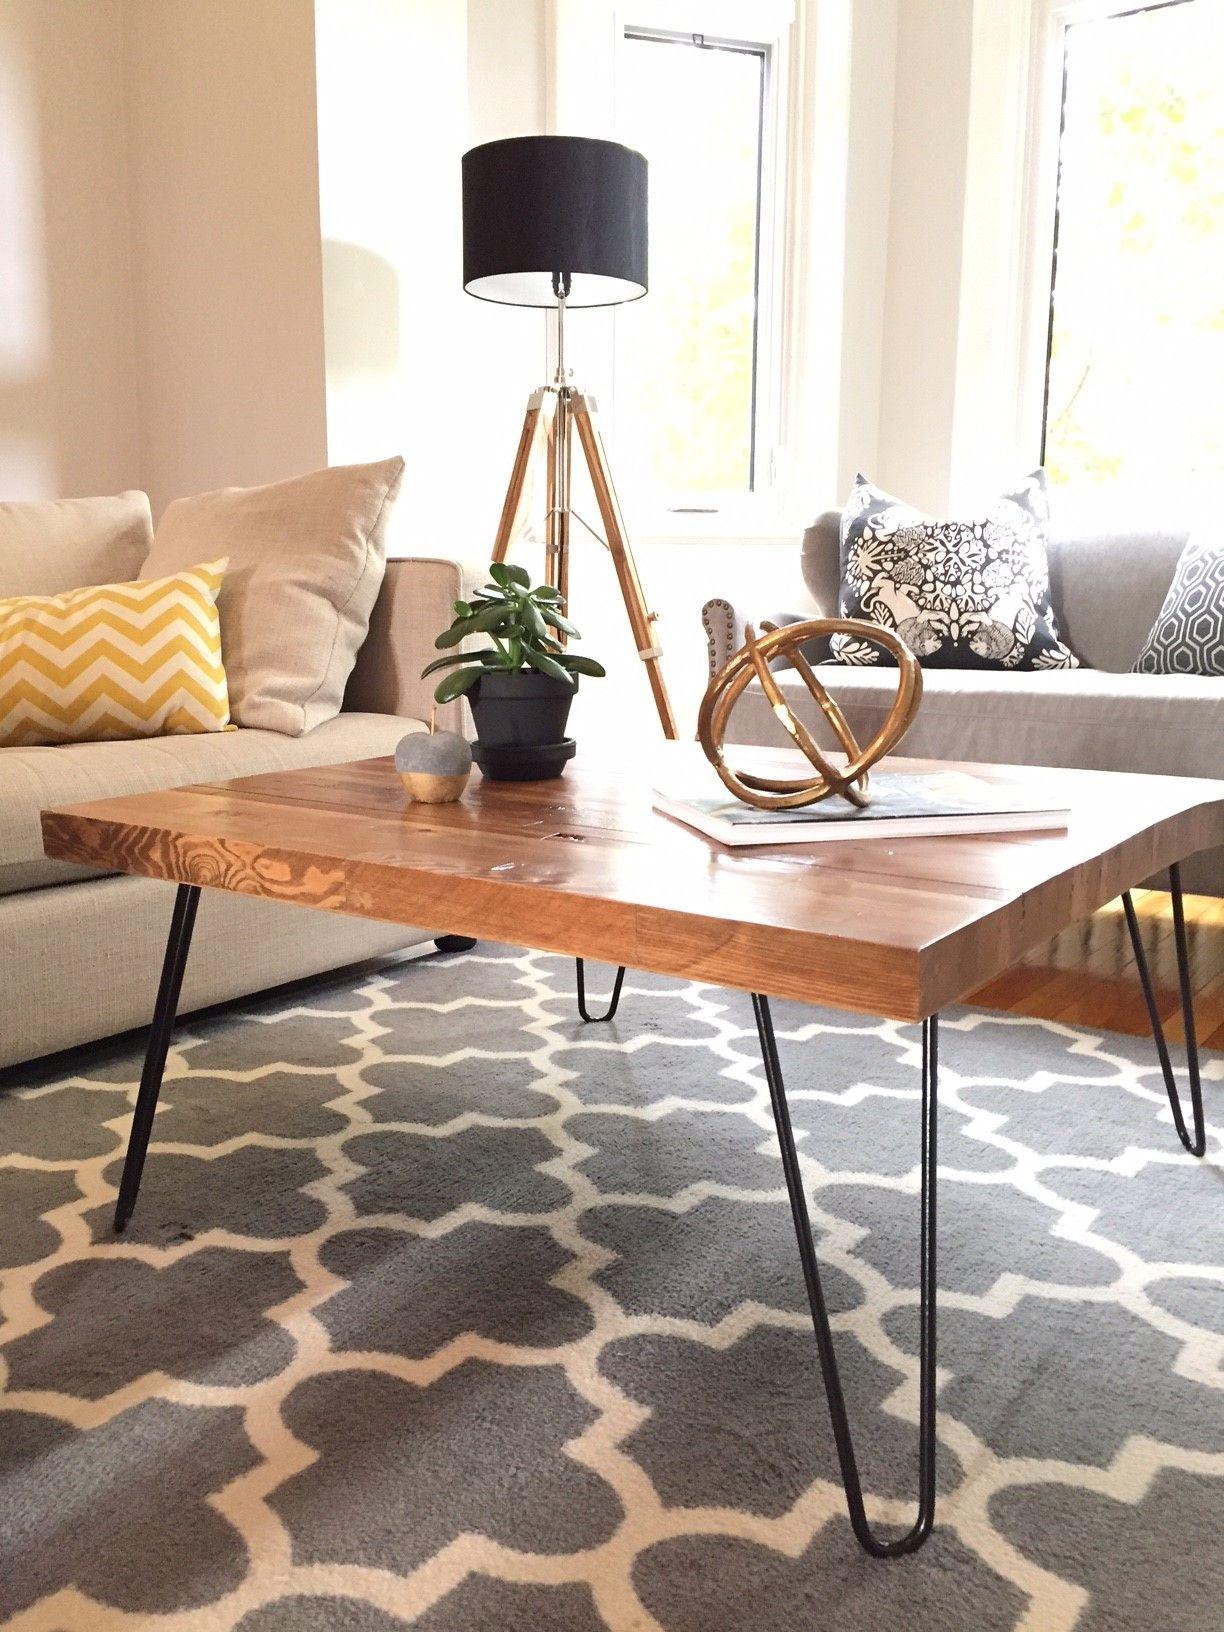 27+ Wood block coffee table diy ideas in 2021